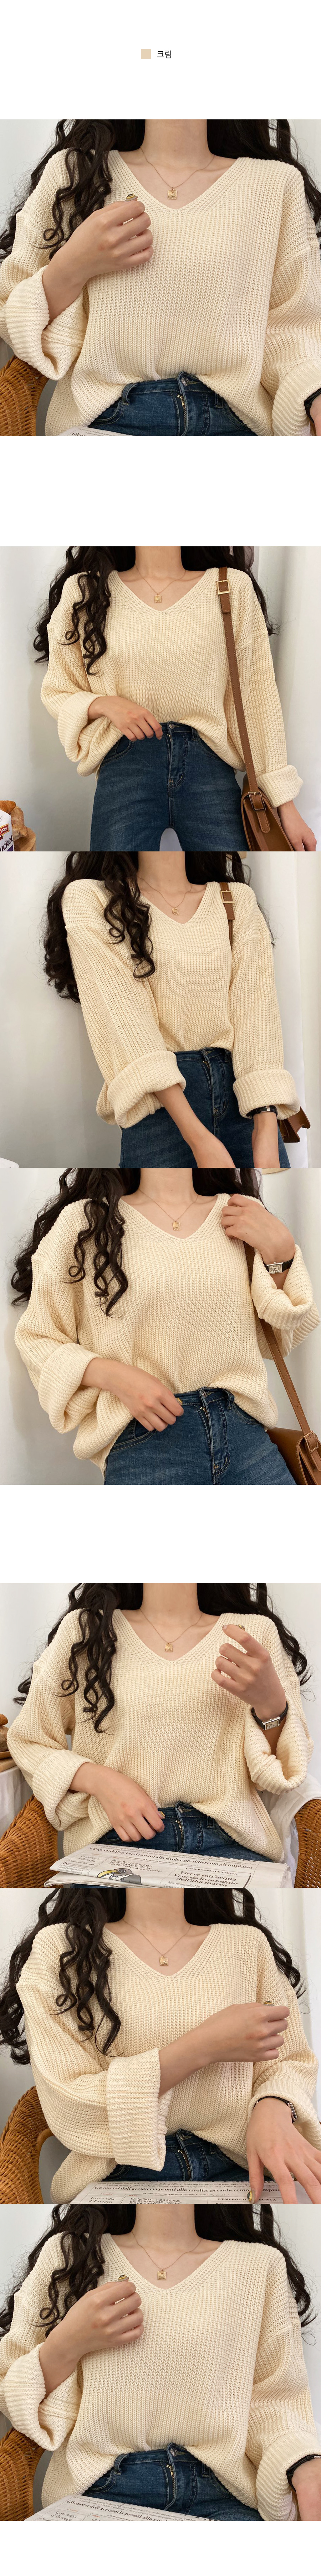 Jay Hachi V-Neck Loose Fit Knit